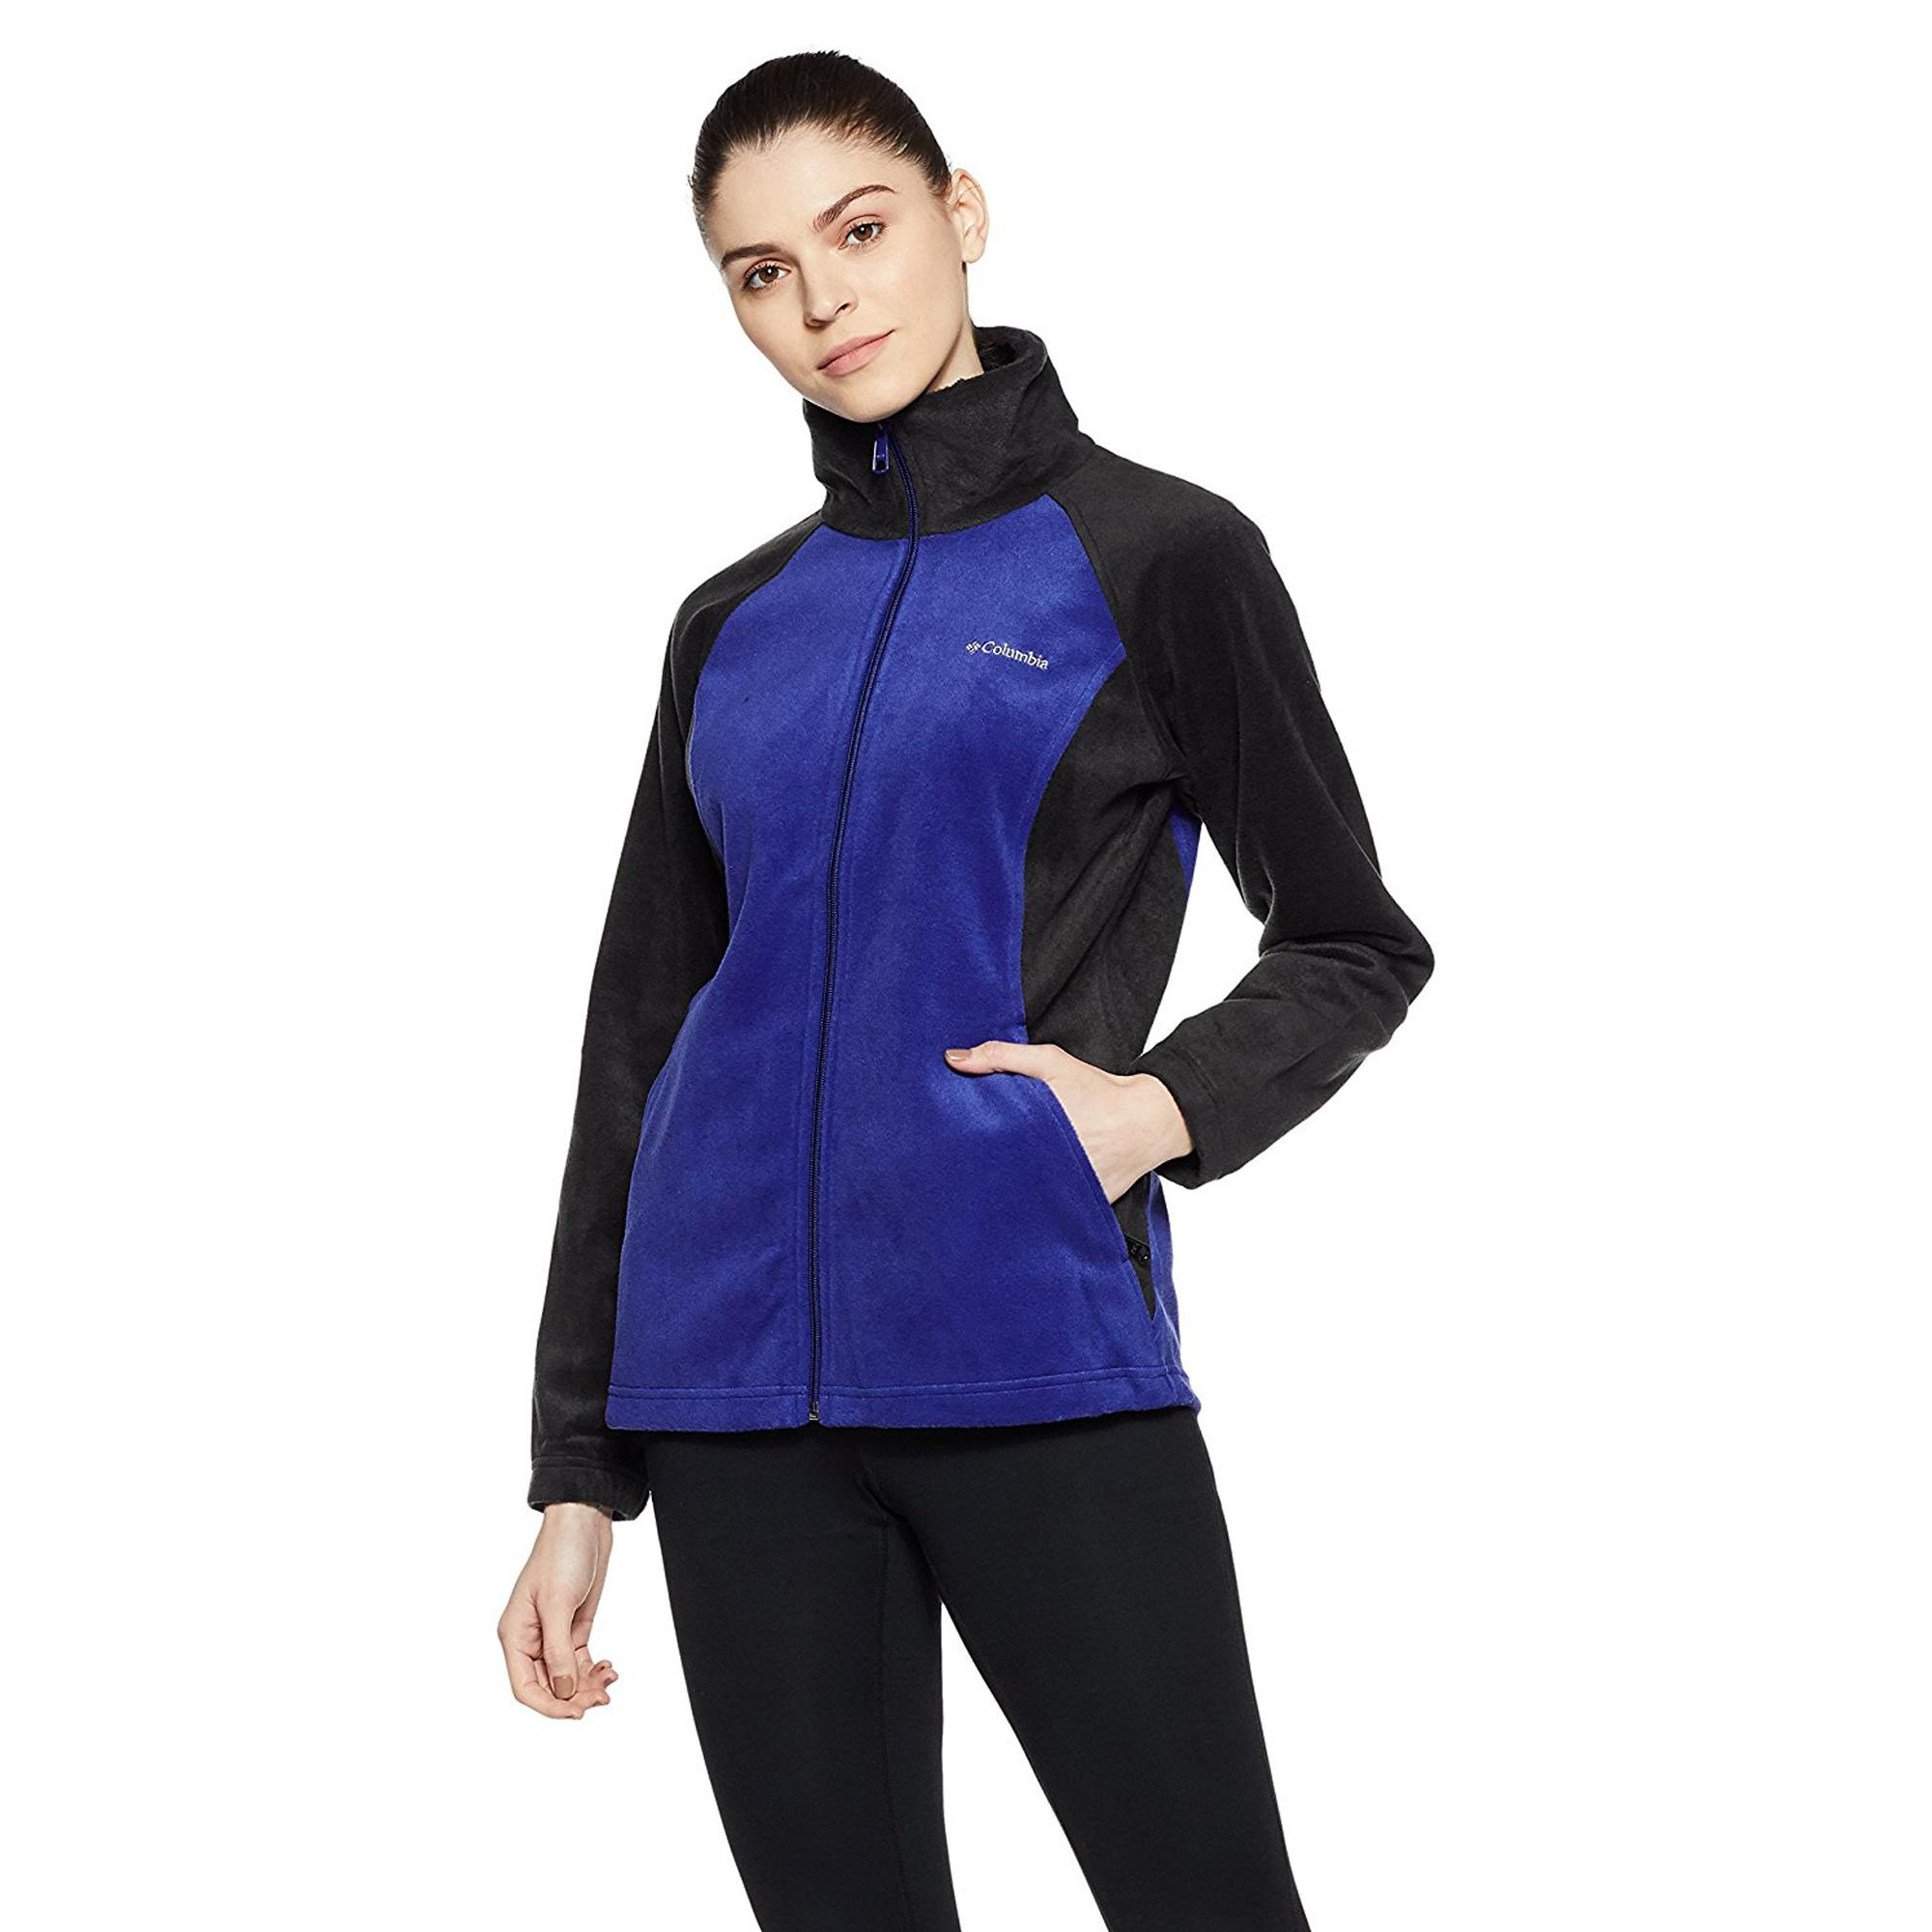 5a1776338da69 Columbia Women's Dotswarm II Fleece Full Zip Thermal Reflective Jacket,  Black/Dynasty, Large